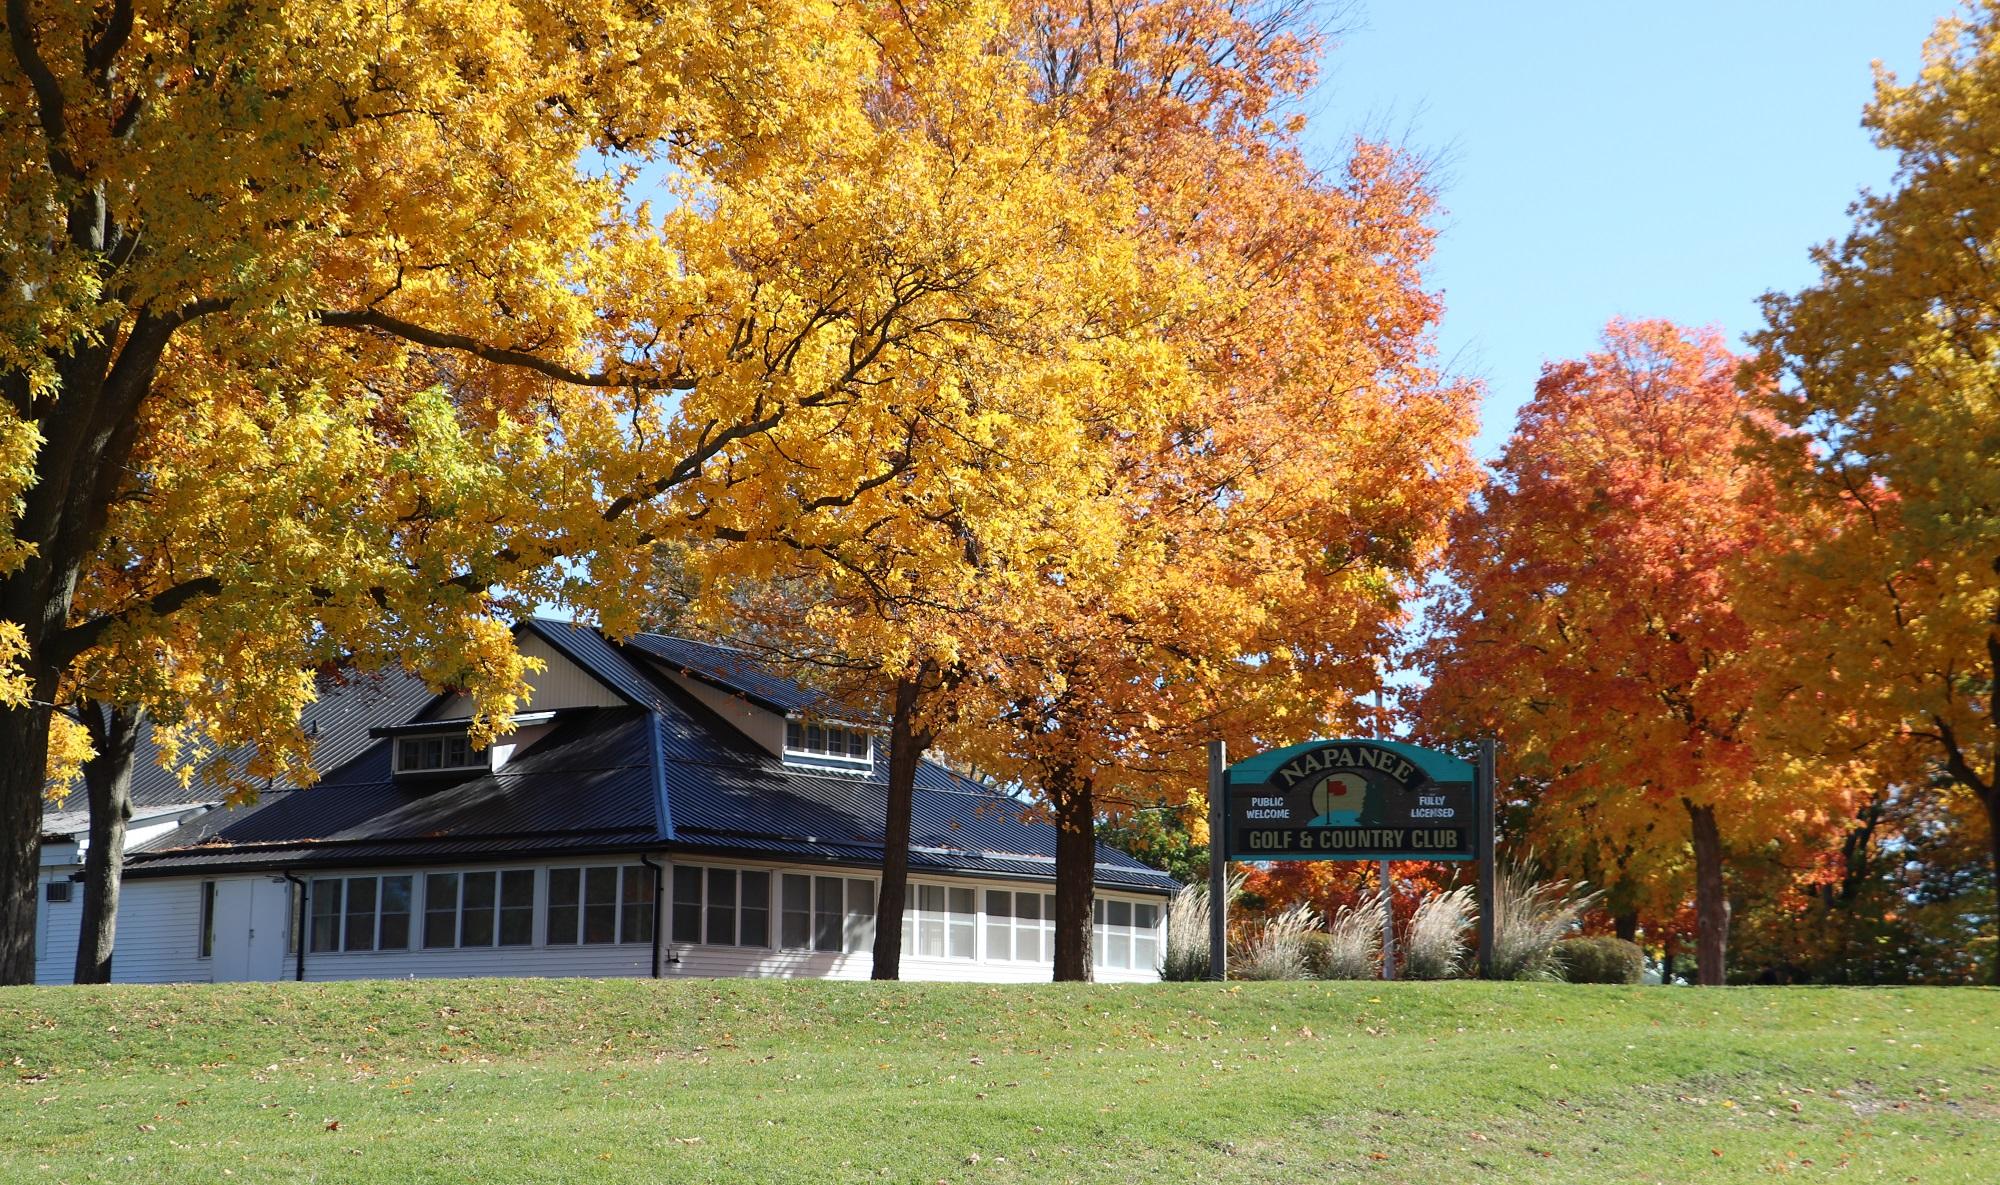 Napanee Golf & Country Club.jpg